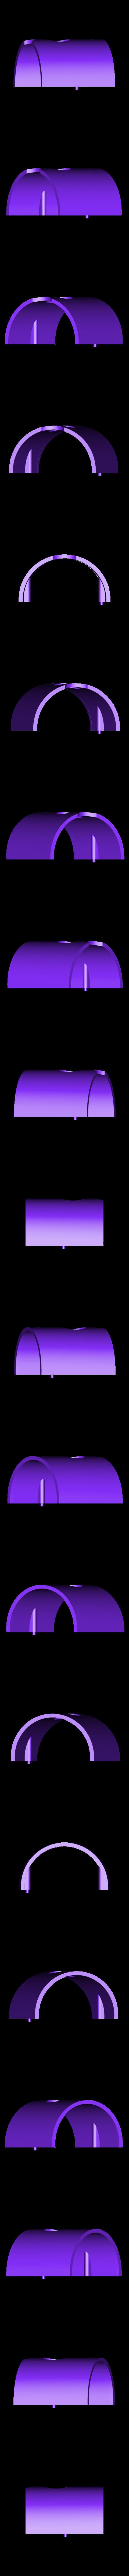 Smoke_Box_-_Part_3-.STL Download free STL file 4-8-8-4 Big Boy Locomotive • 3D printer object, RaymondDeLuca